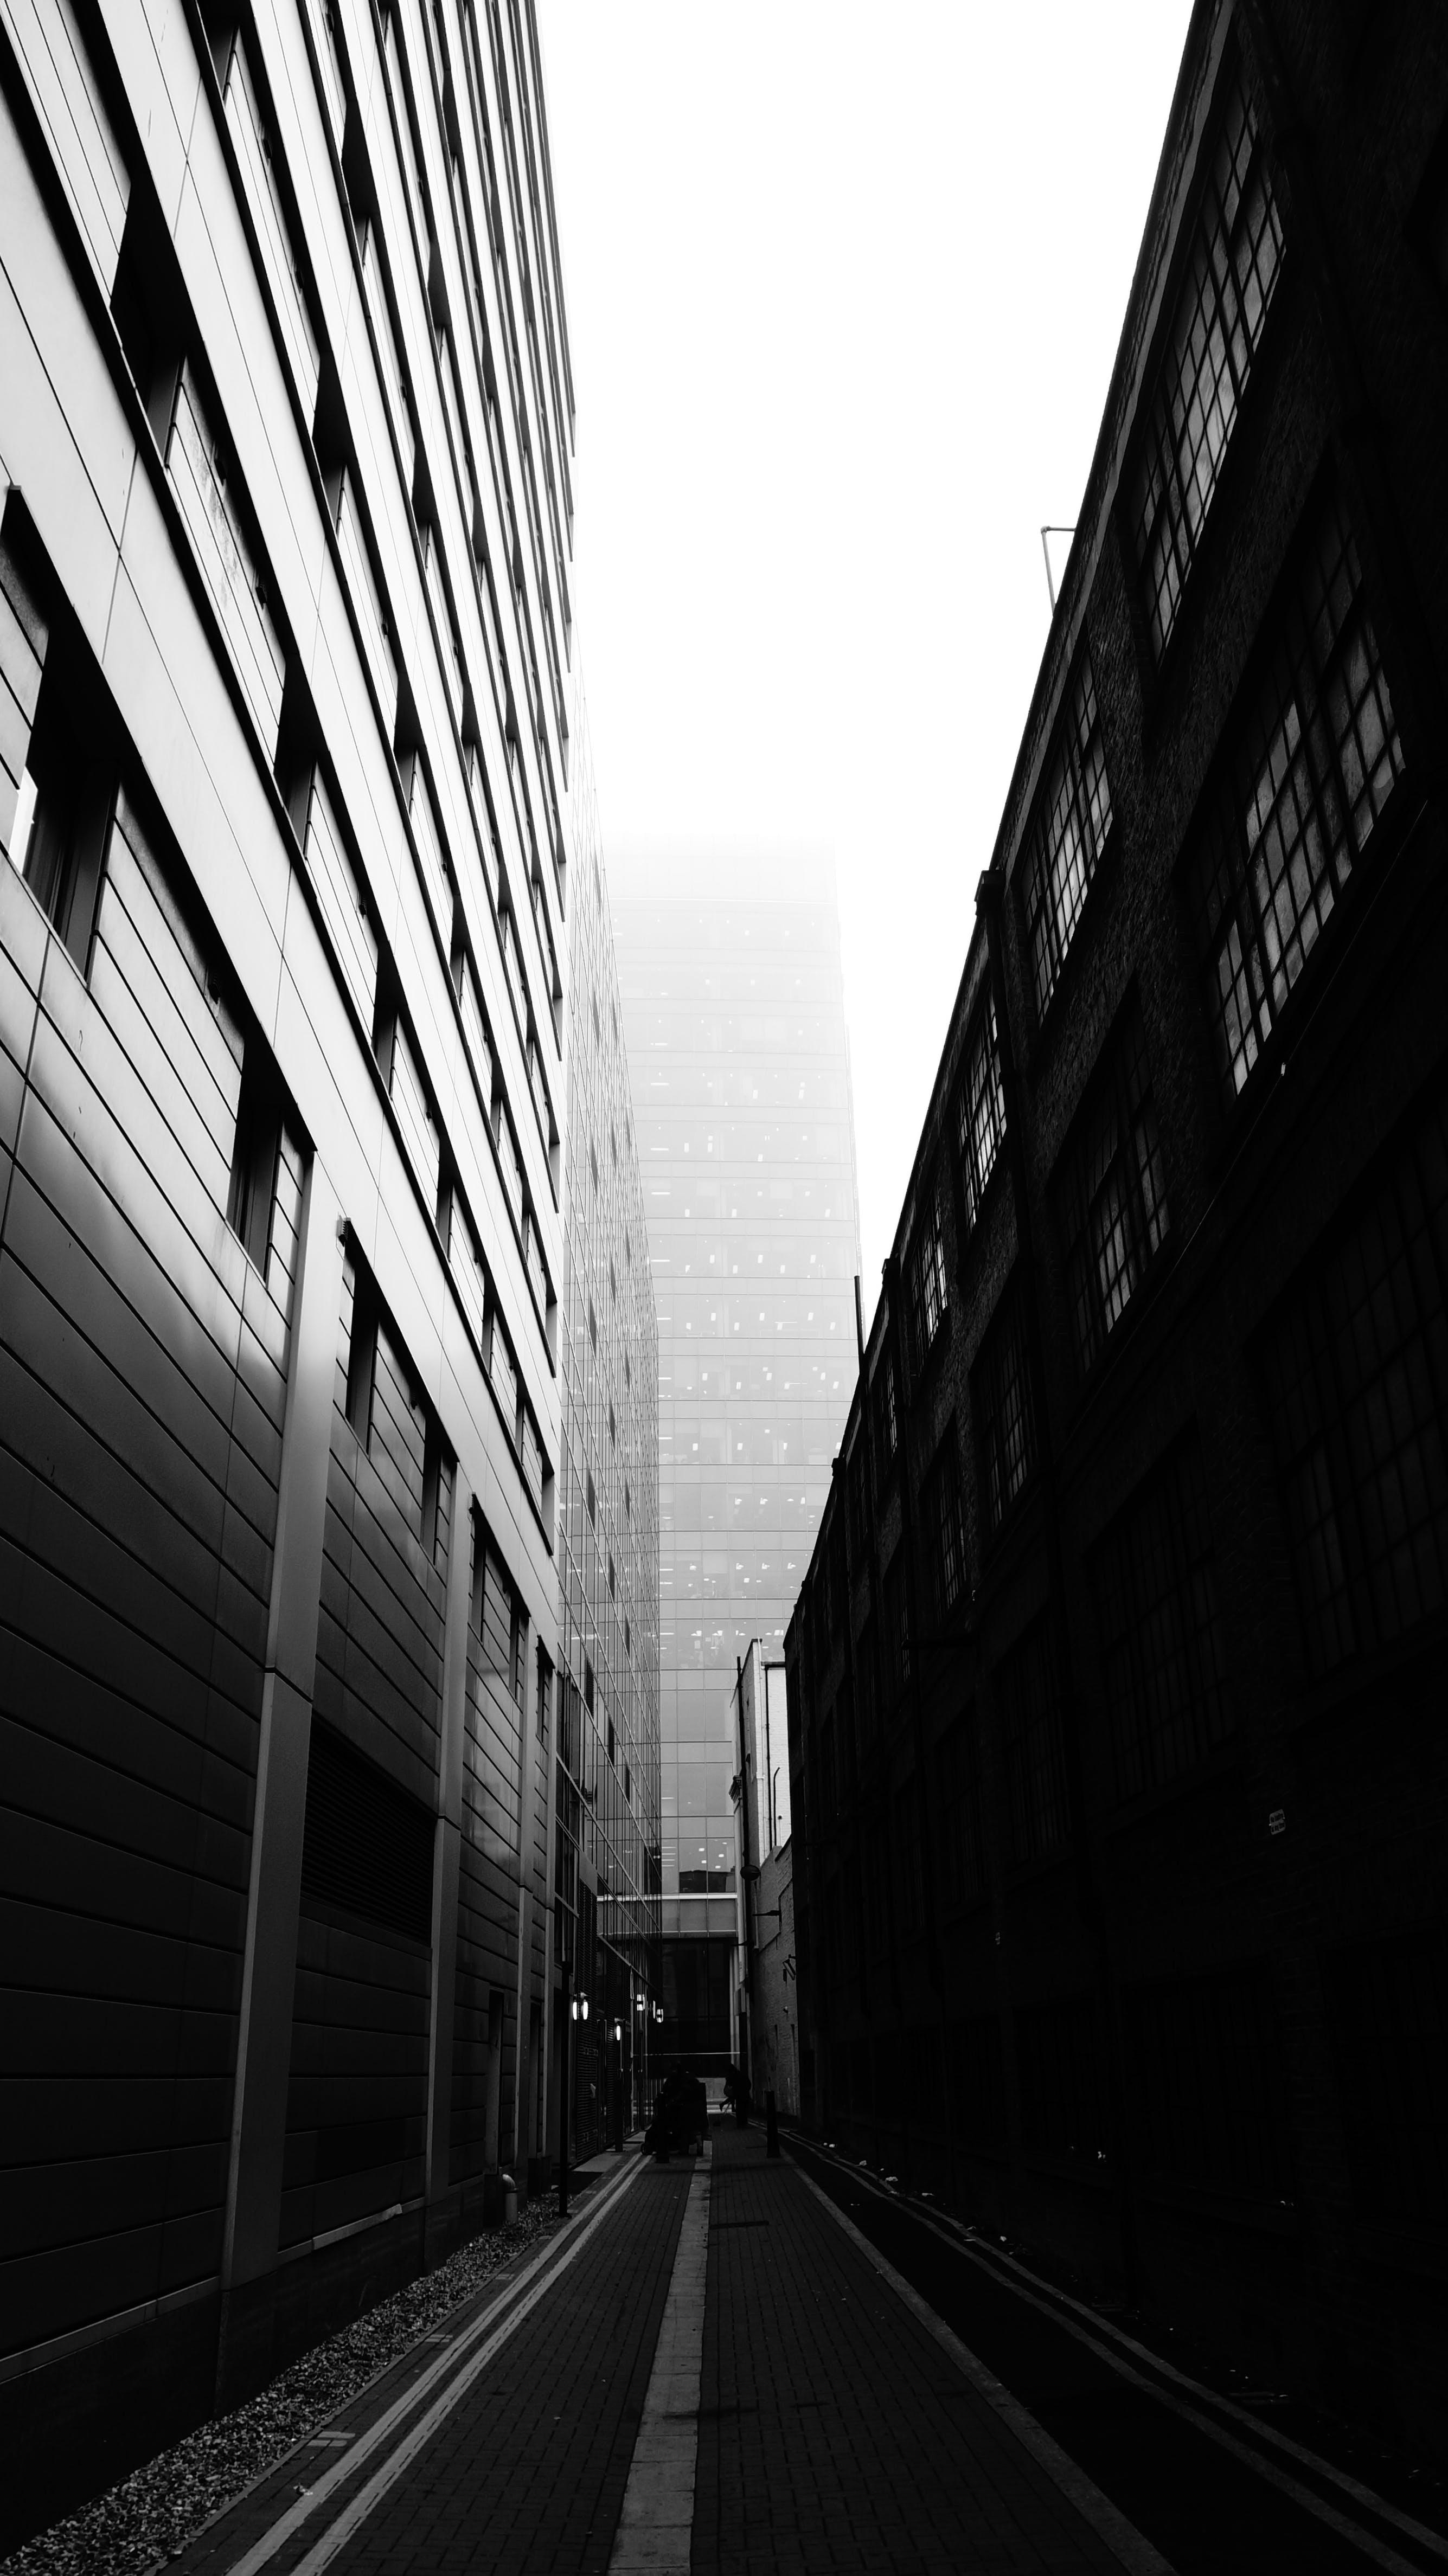 Concrete Buildings Grayscale Photography